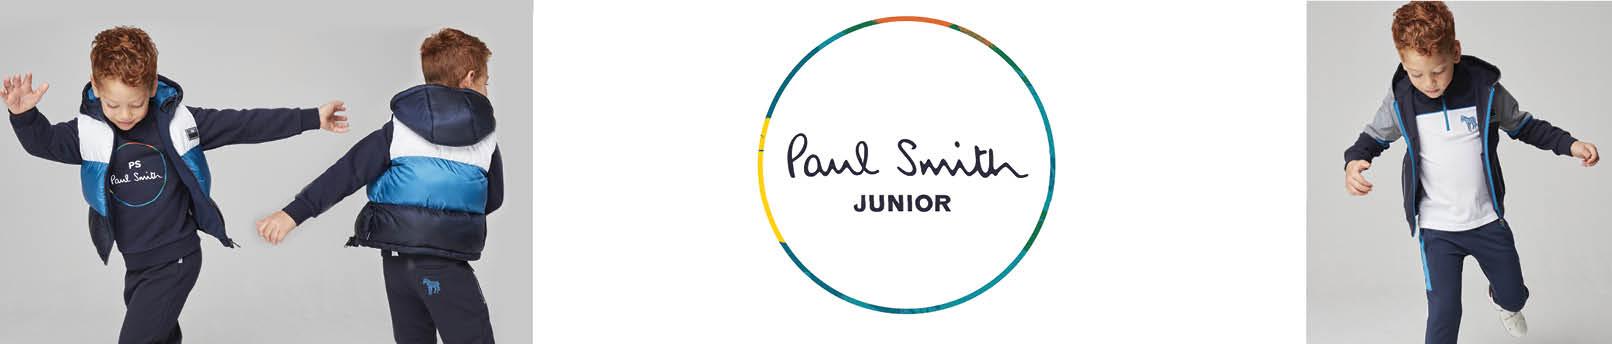 Discover Paul Smith Junior